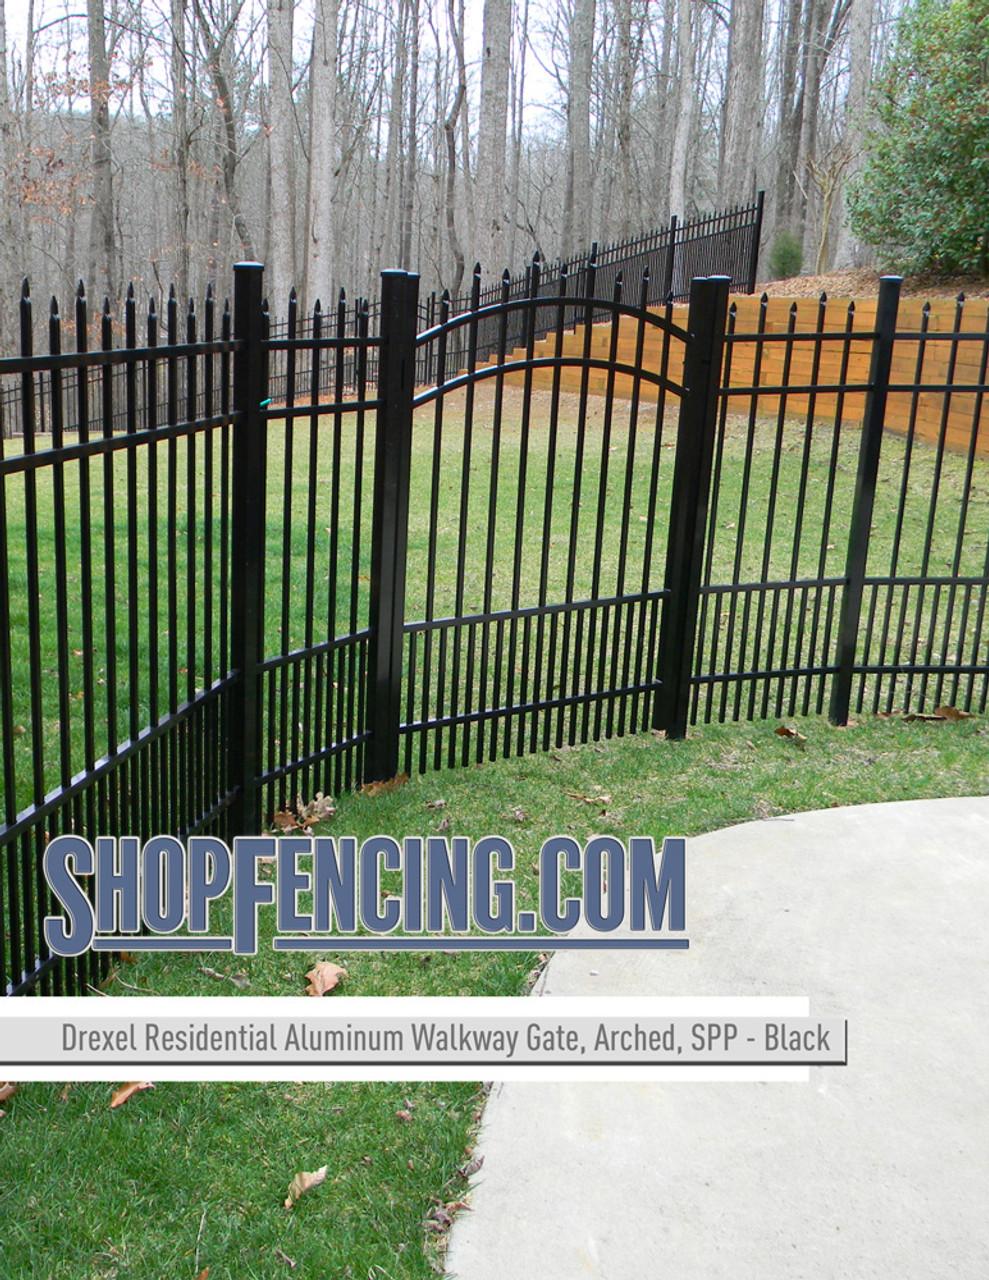 Black Residential Drexel Aluminum Walkway Gate From ShopFencing.com